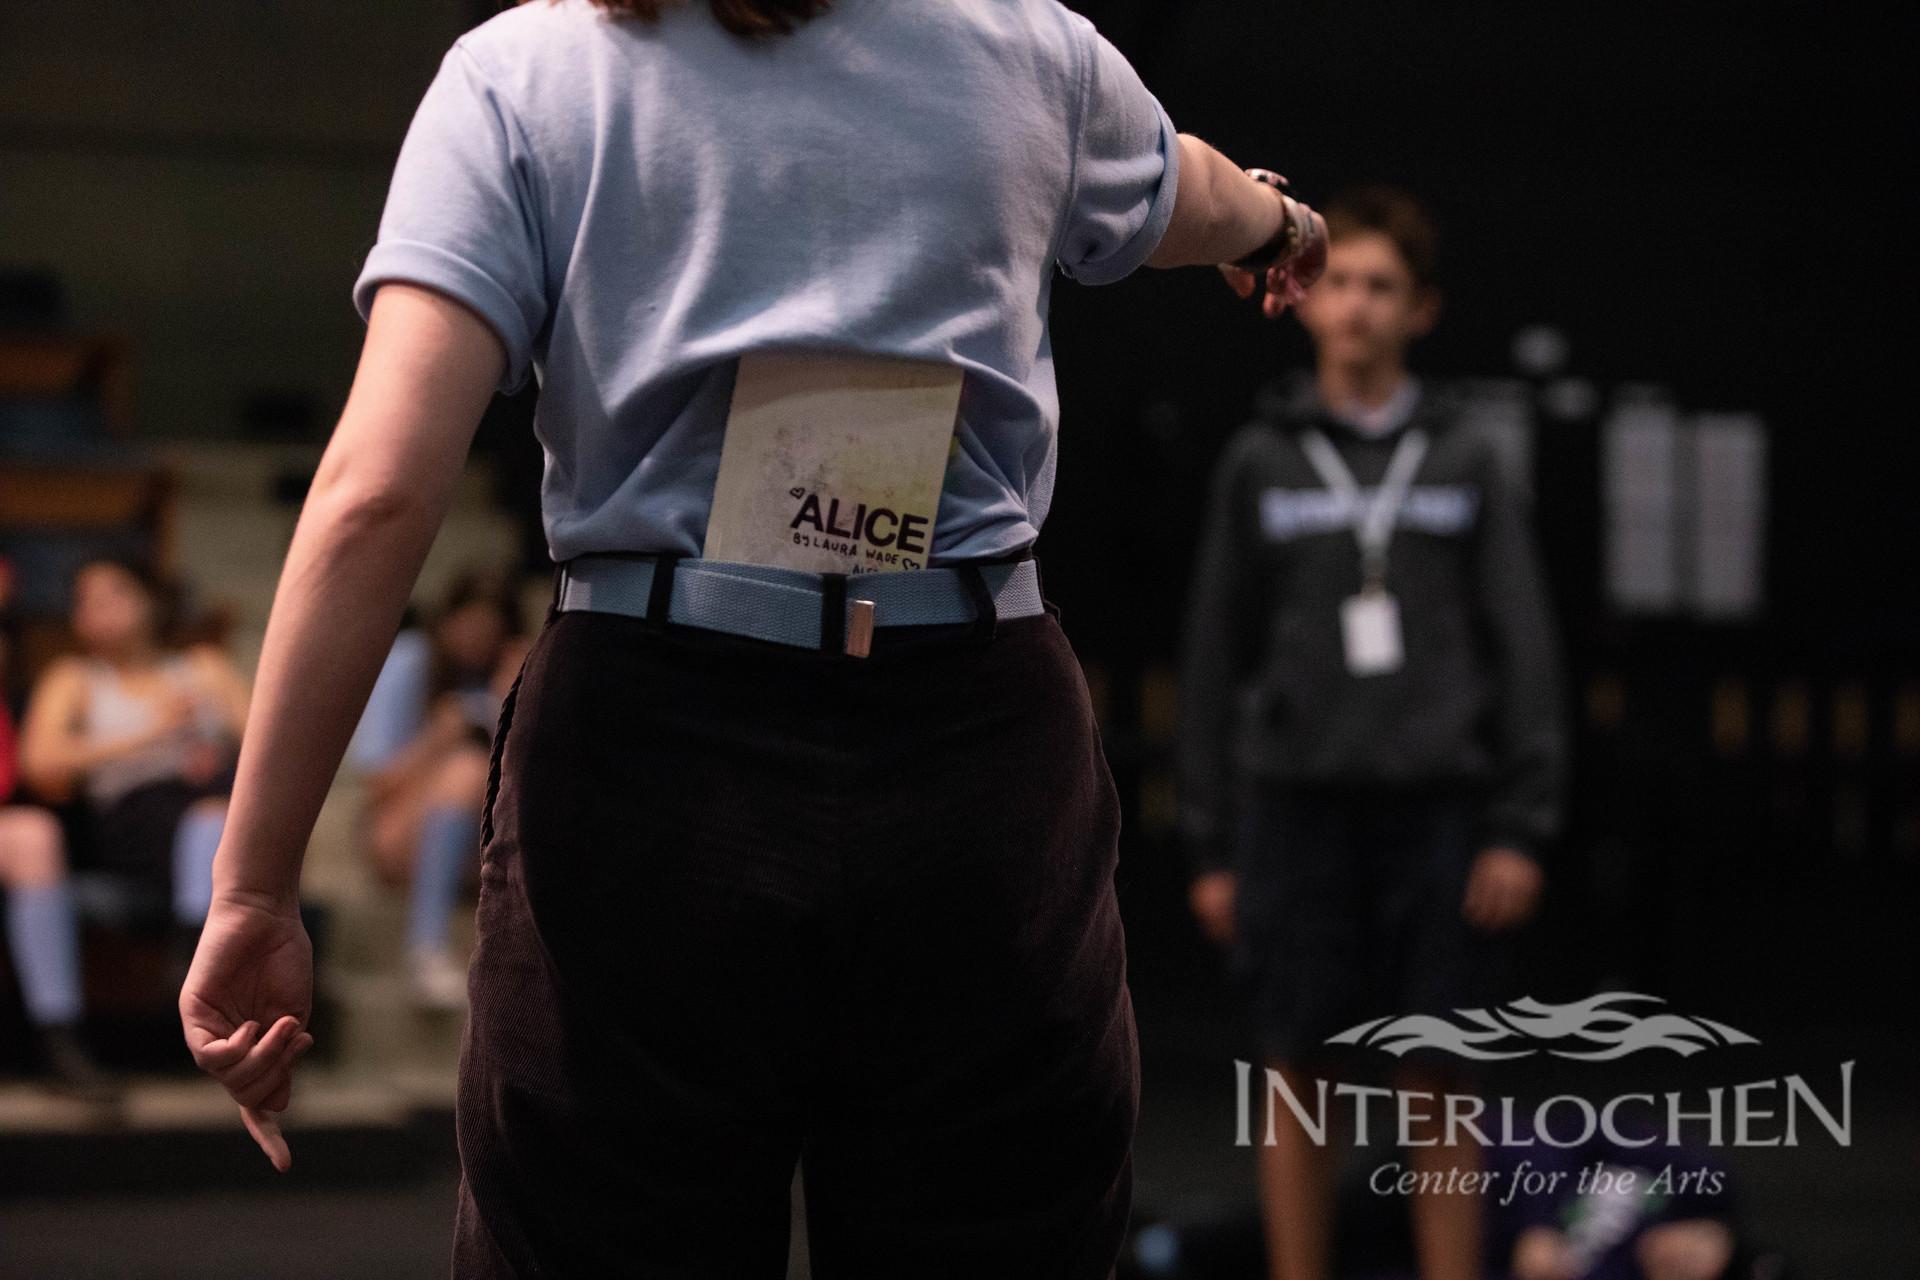 Alice IAC 024 Rehearsals.jpg